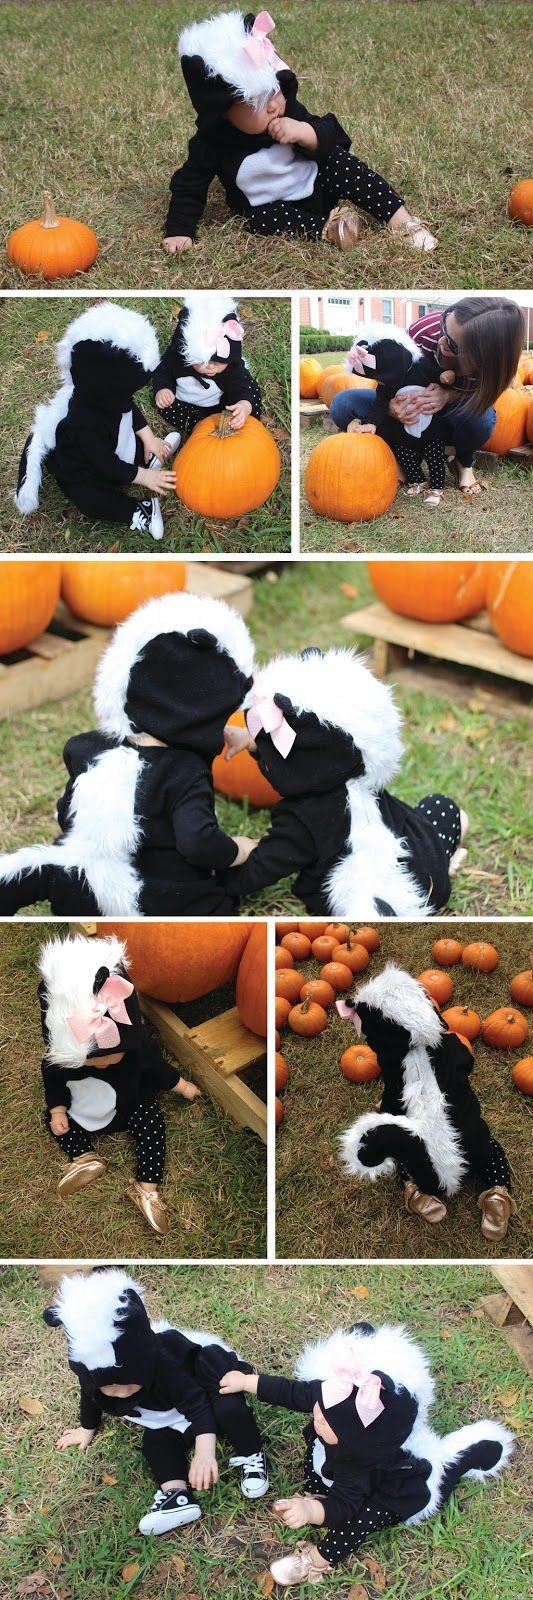 cornflake dreams.: baby's first #halloween costume. #babyhalloween #babyskunk